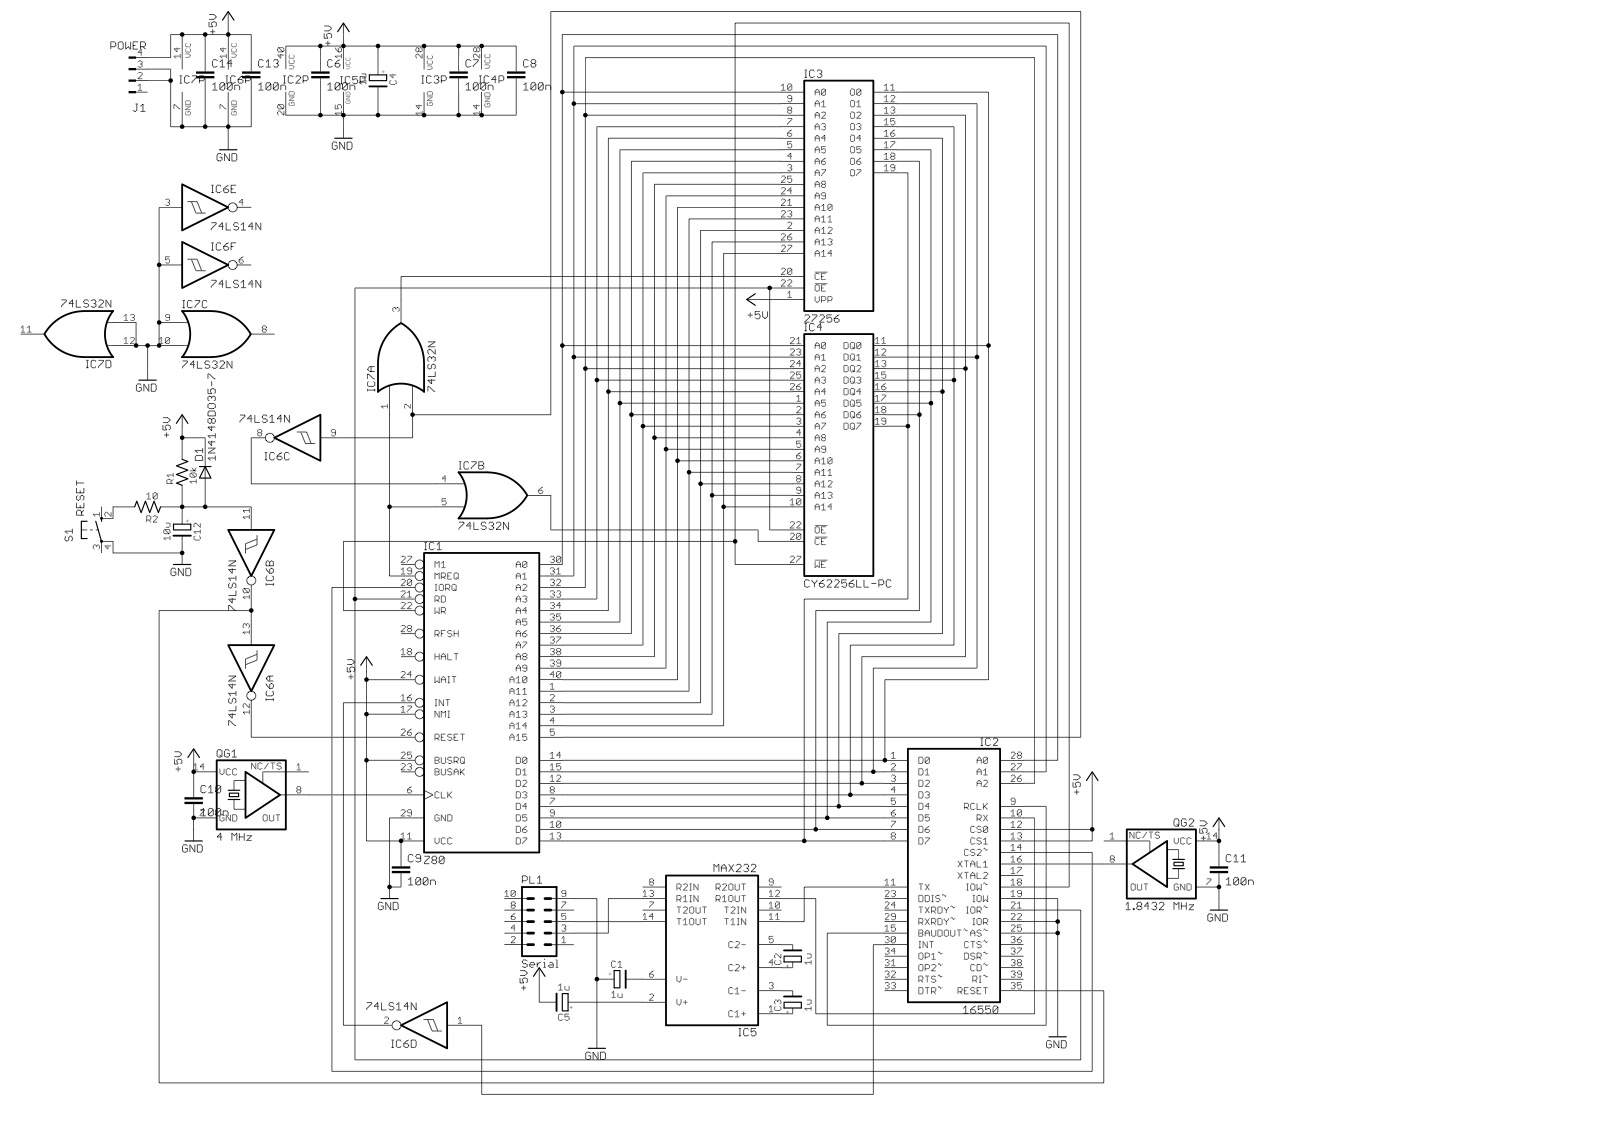 Retro Fieber: Z80 oder 68000 ? - Mikrocontroller.net